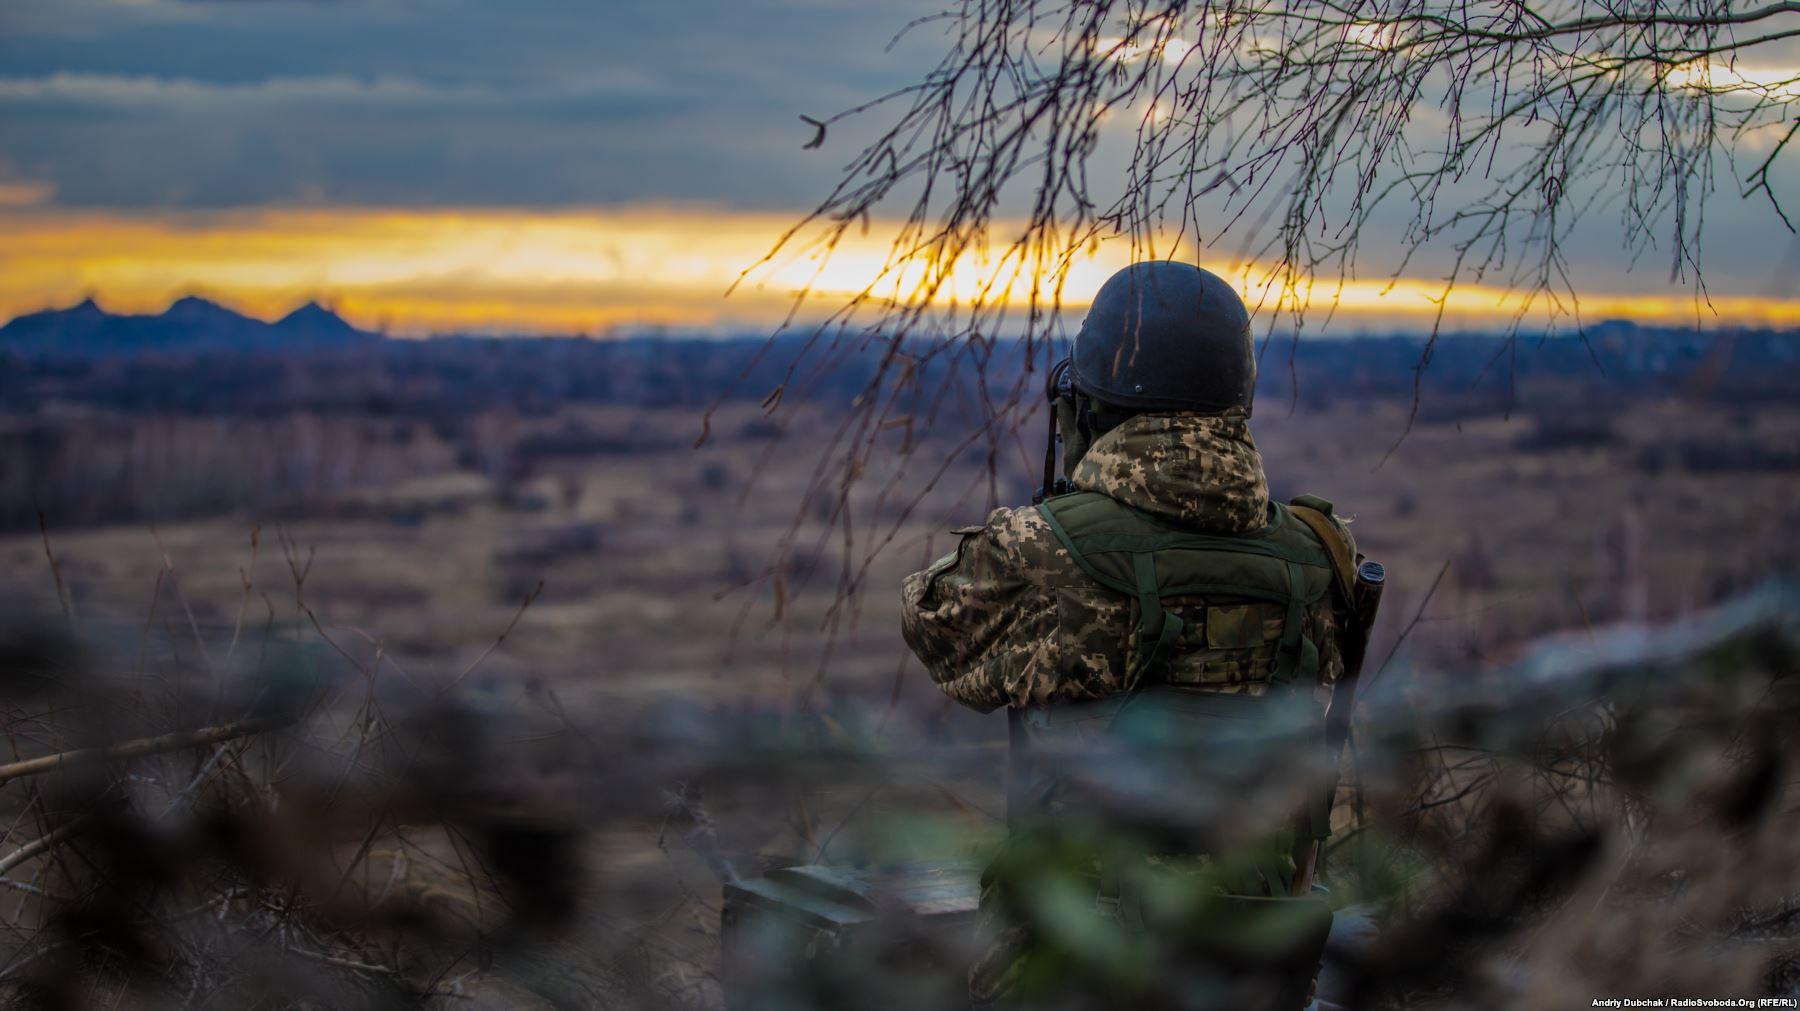 photo by Andriy Dubchak